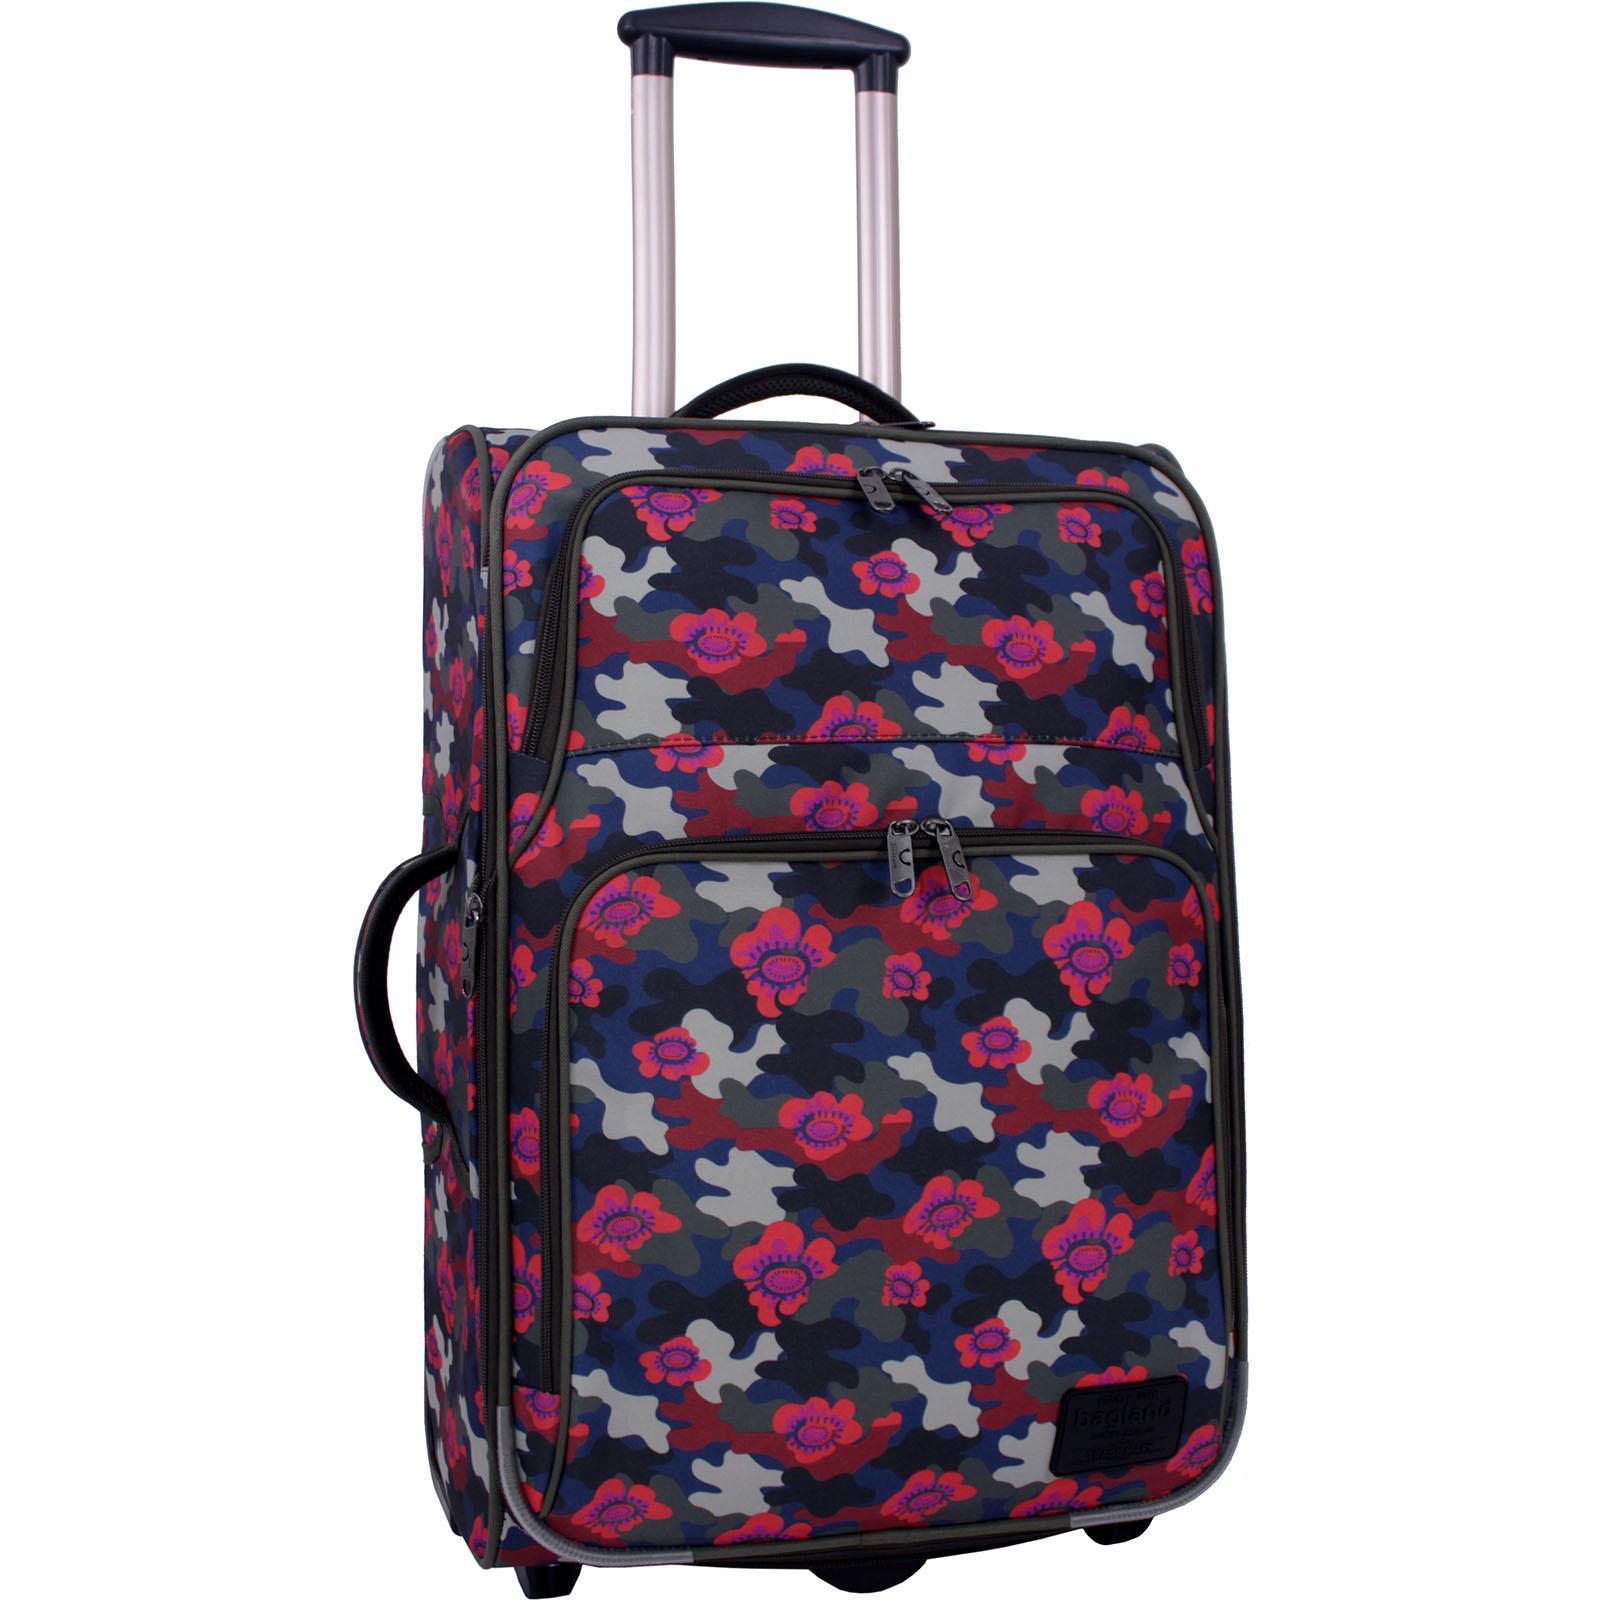 Дорожные чемоданы Чемодан Bagland Леон средний дизайн 51 л. сублімація 459 (0037666244) IMG_4779_суб.459_.JPG